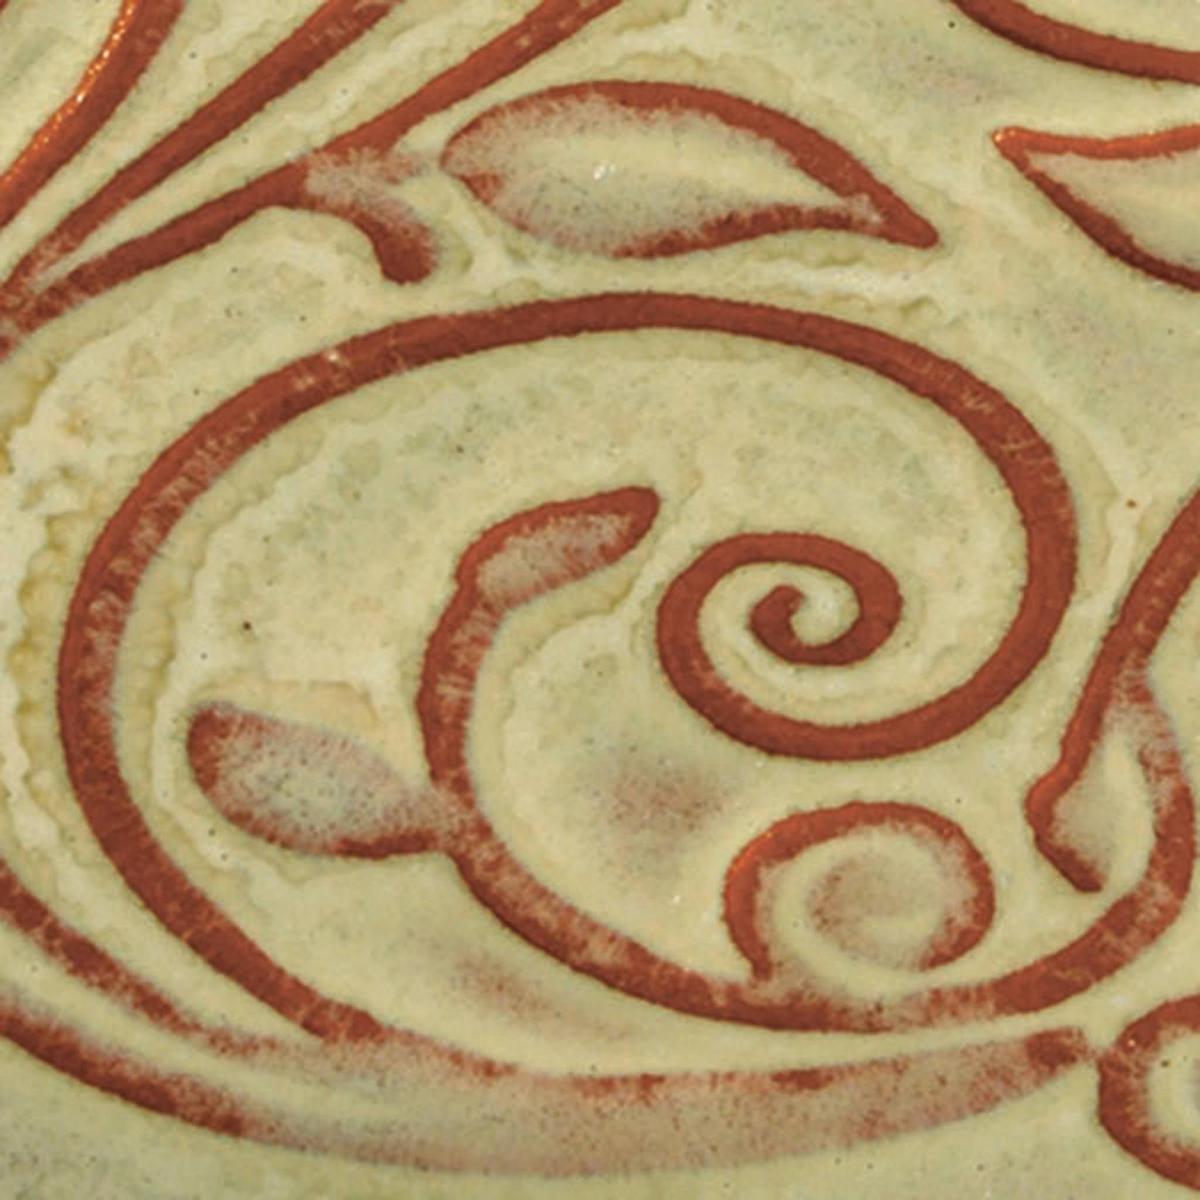 venta de esmalte para cerámica amaco opalenscent O-30 Autum leaf baja temperatura